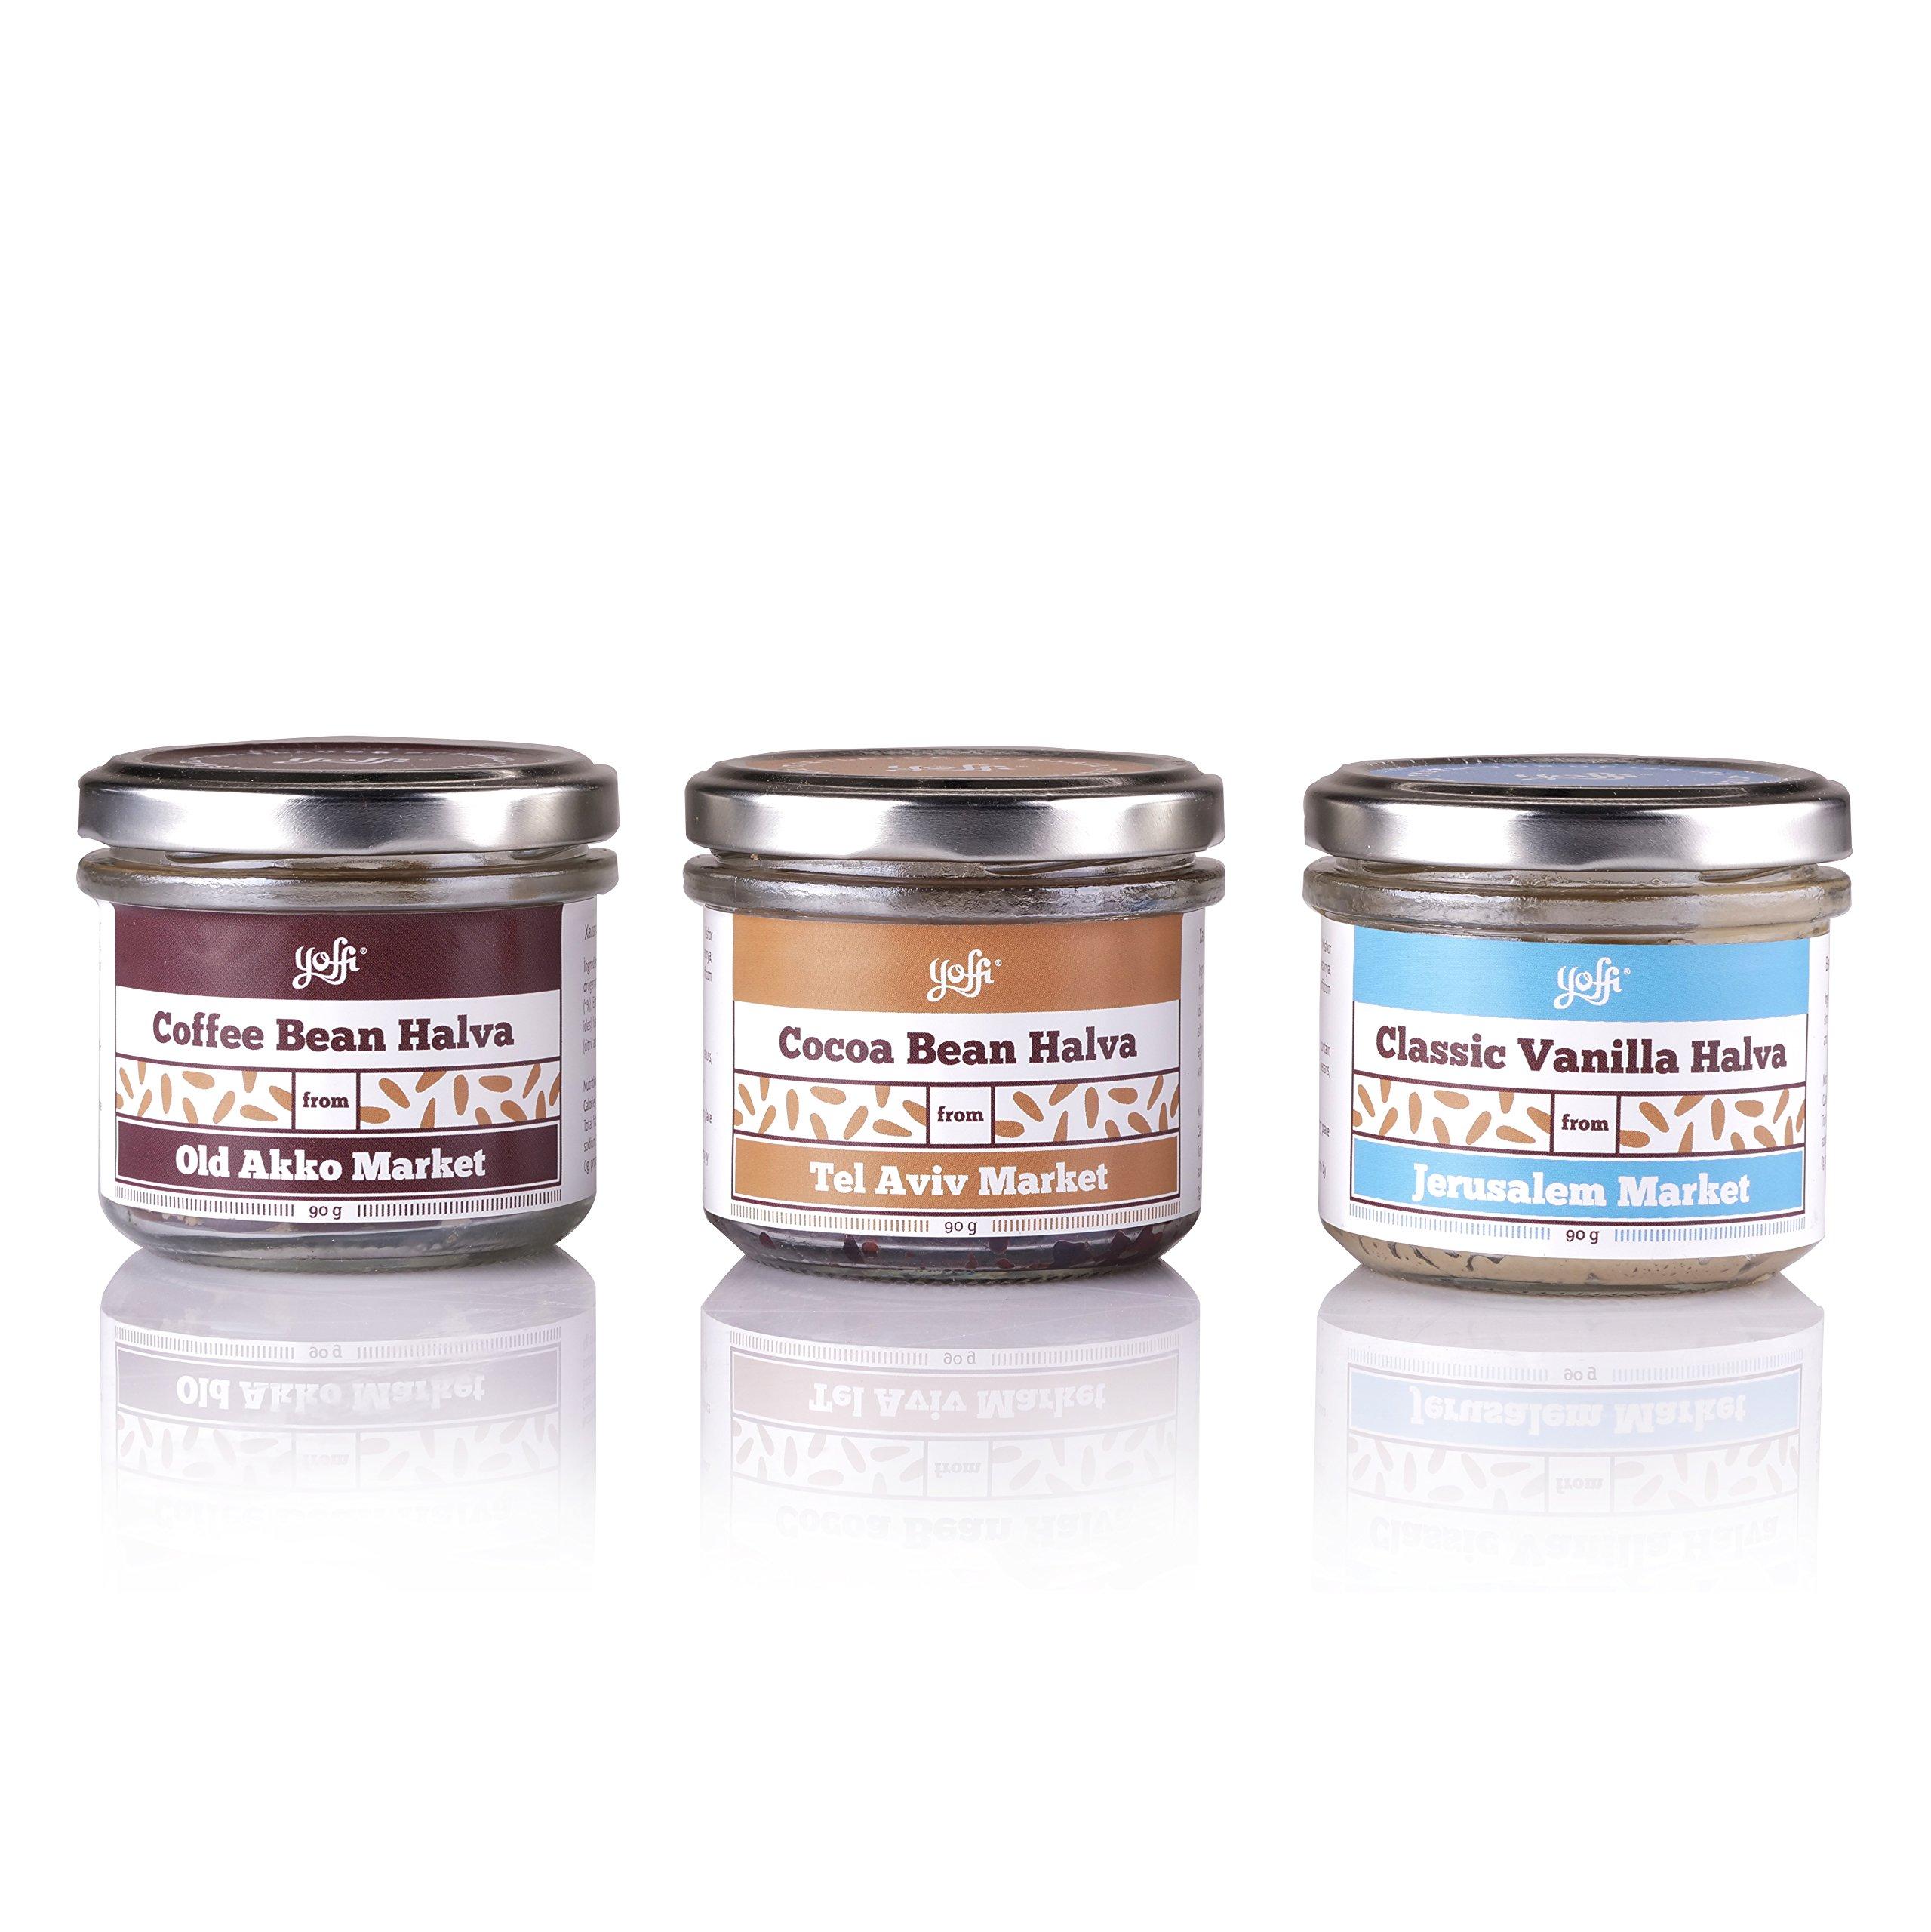 Yoffi Gift Set Natural Israeli Authentic Halva Spread Premium Gourmet Set 3 Delicious Flavors Vegan Friendly Kosher Pareve